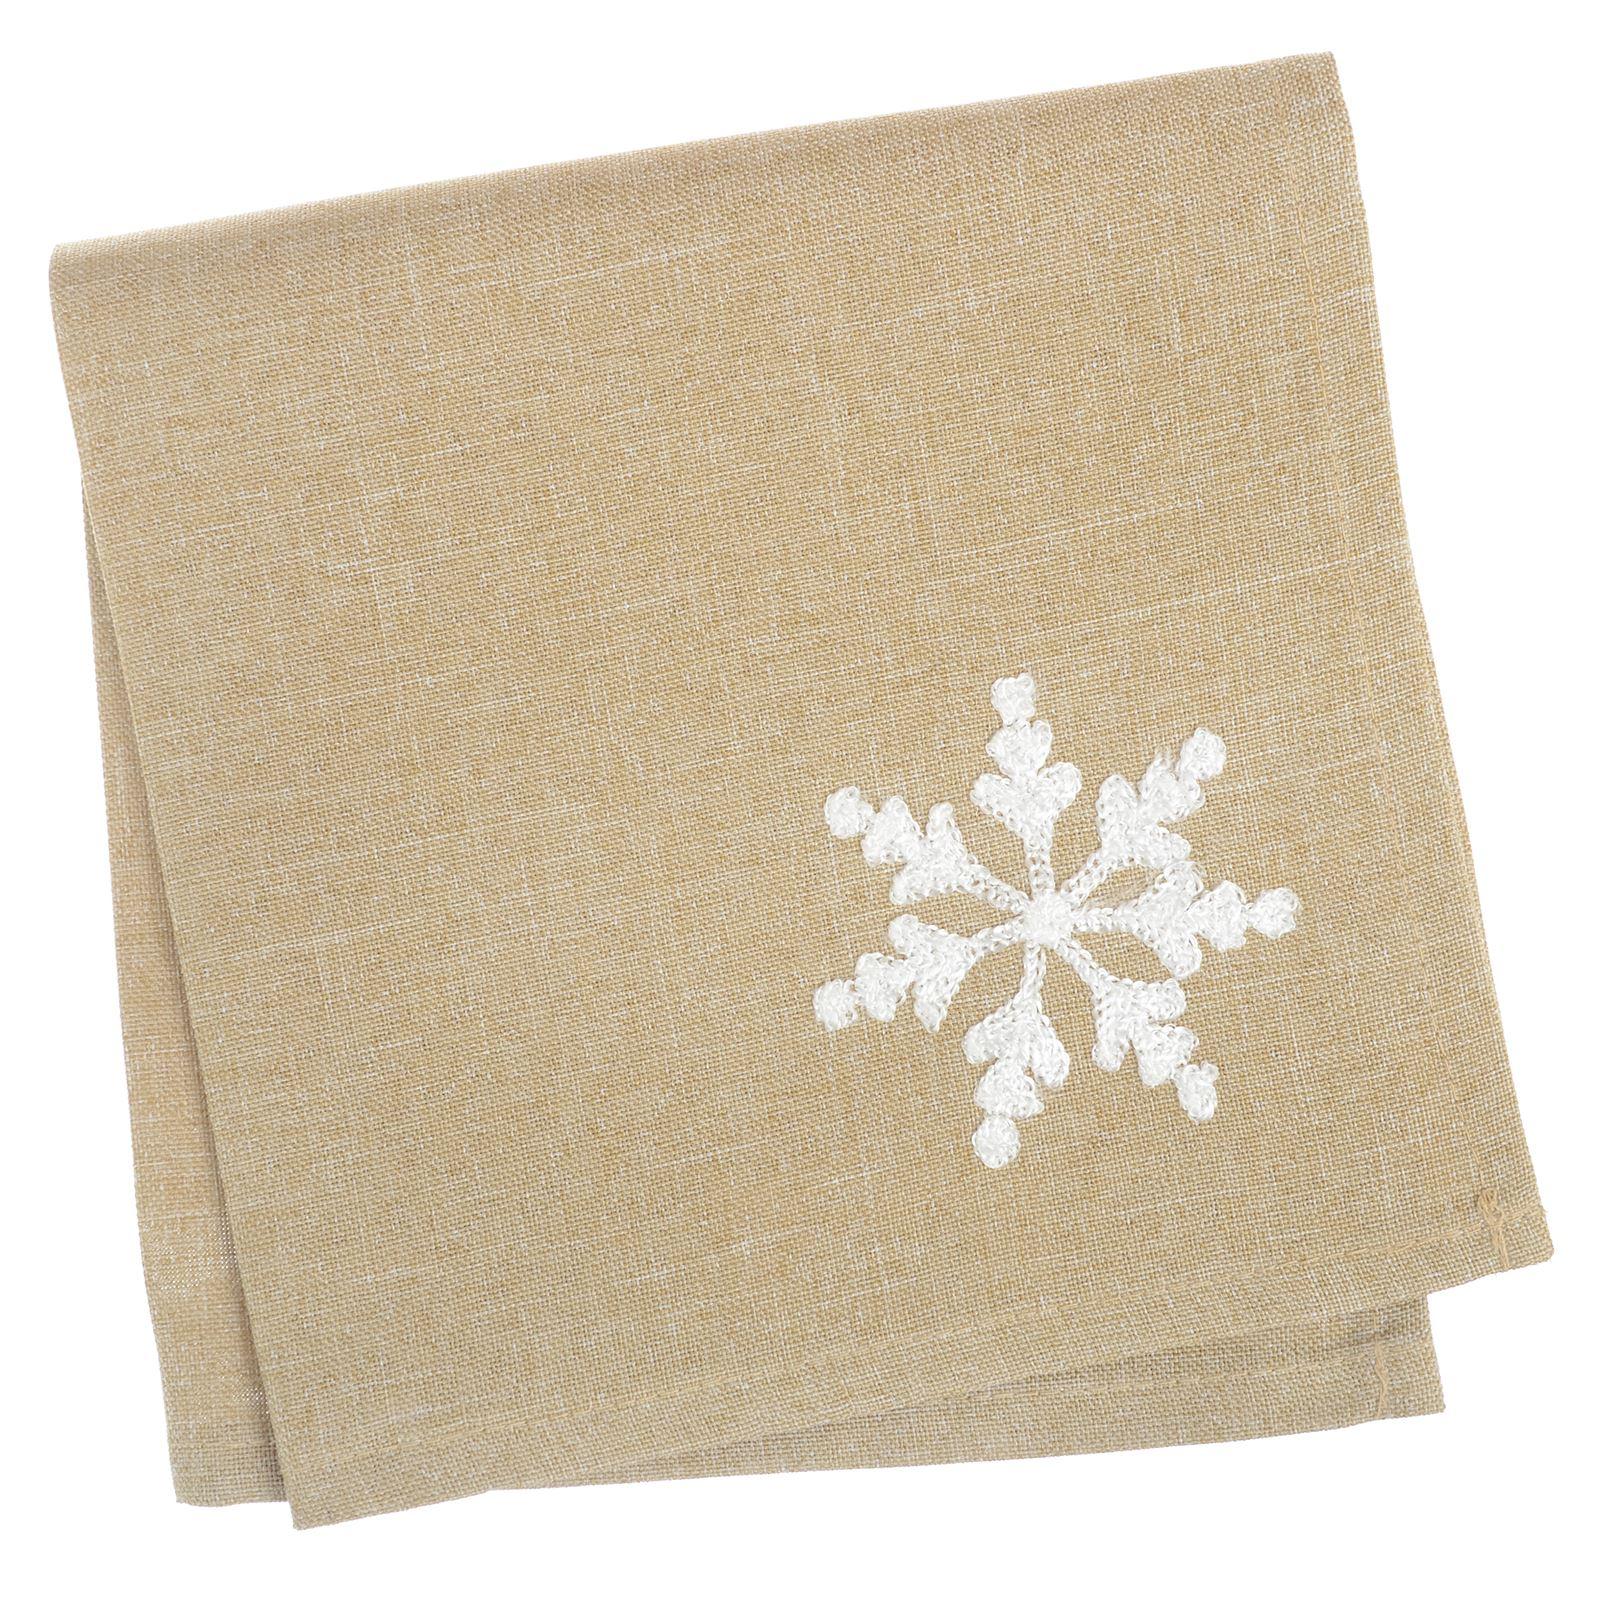 Christmas-Tablecloth-Festive-Pattern-Rectangle-Round-Fabric-Xmas-Room-Decoration Indexbild 103